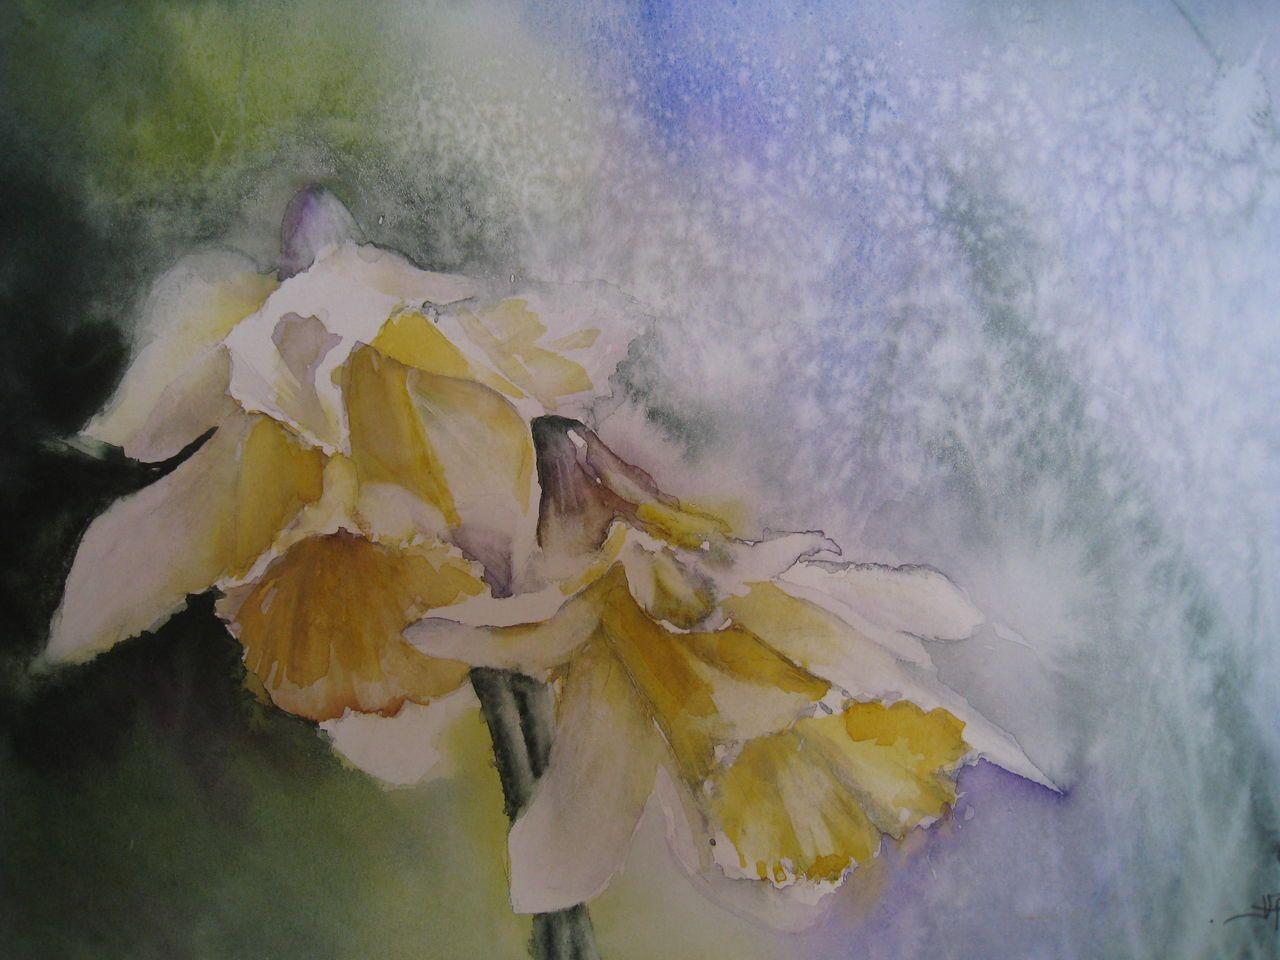 50x50 Aquarelles Aquareldrawing Watercolour Watercolor Art